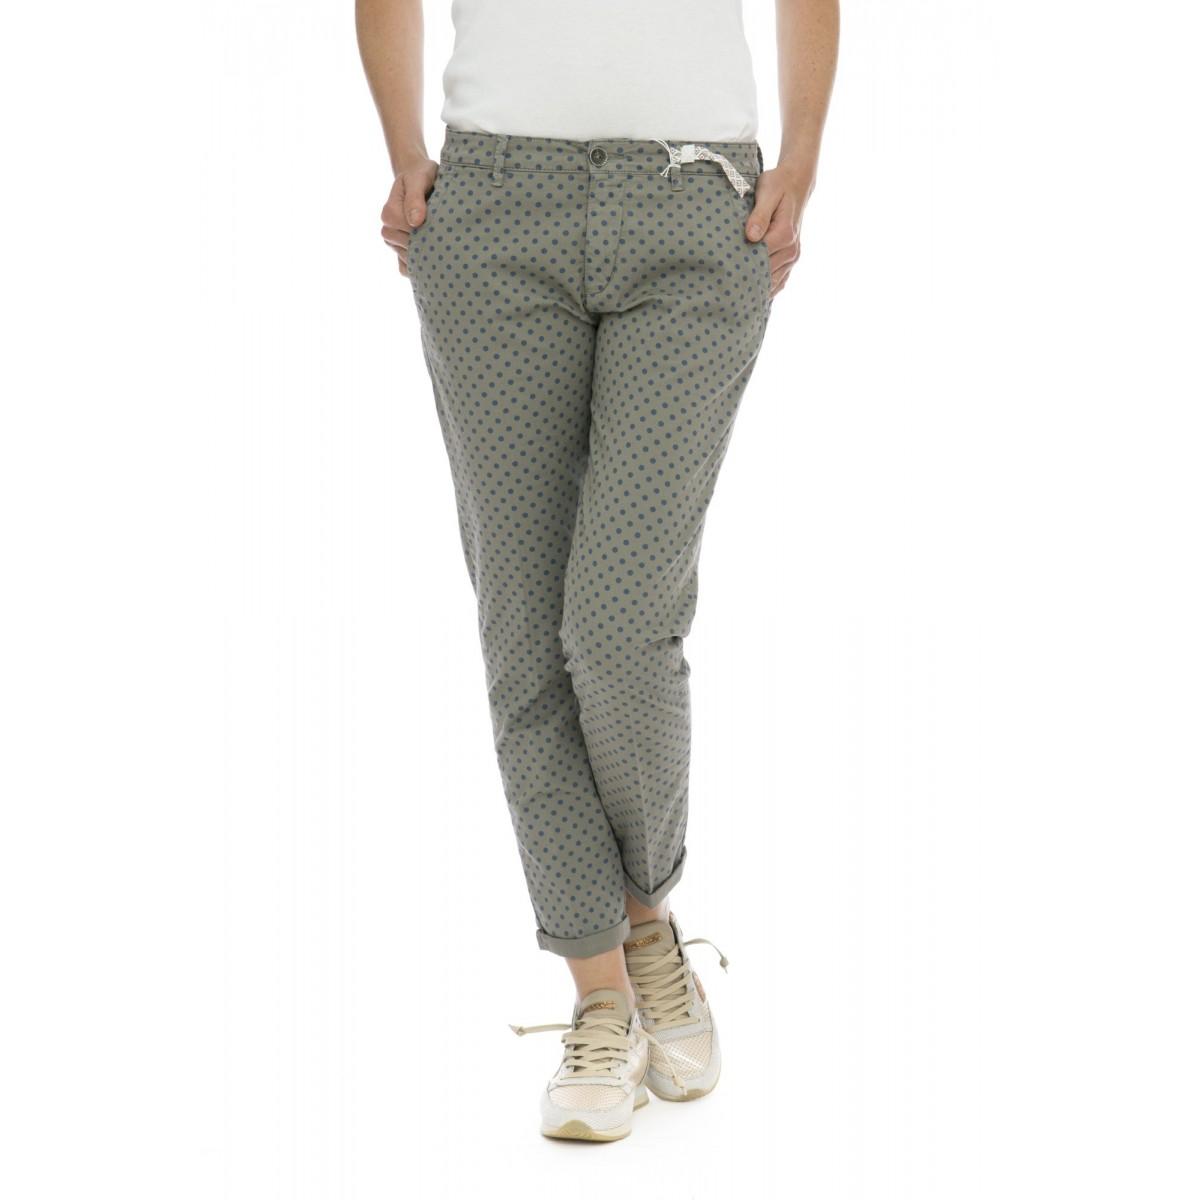 Pantalone donna - Rachel 9679